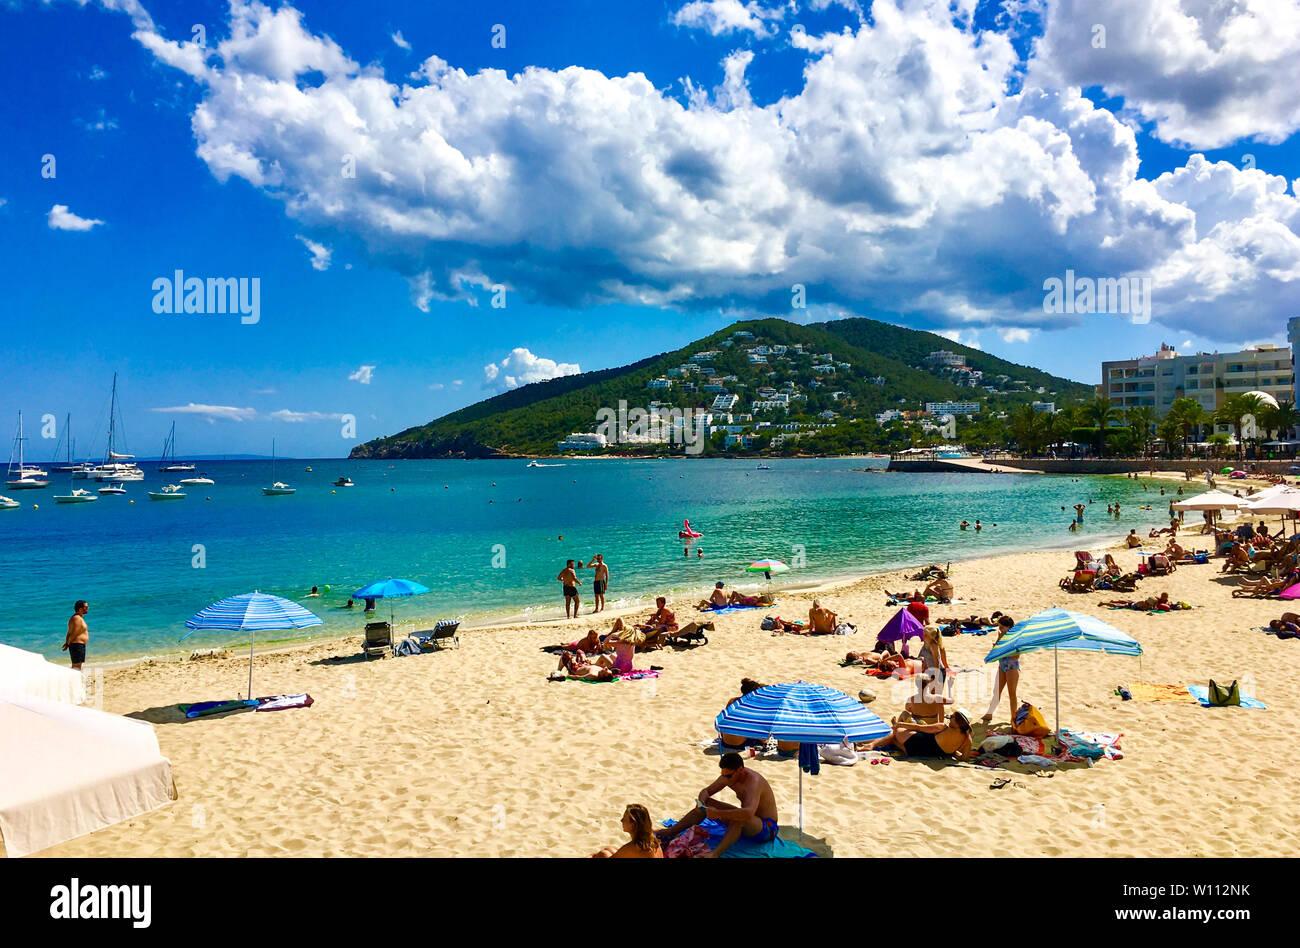 30 June 2017: Santa Eularia, Ibiza, Spain - The beach of